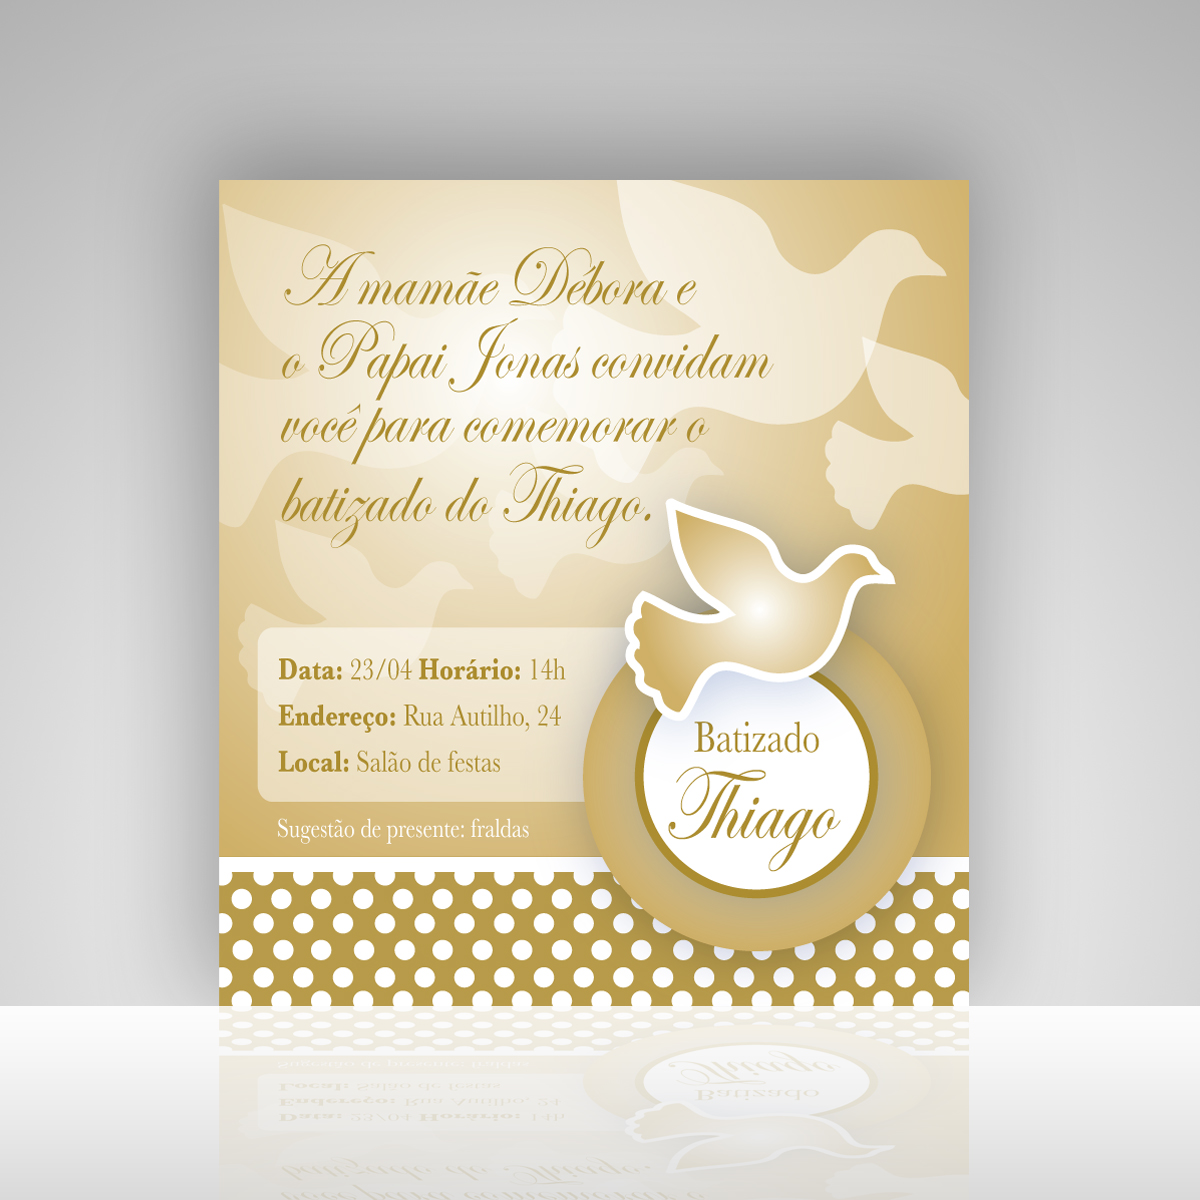 Convite Digital Batizado Boy Dourado No Elo7 Angeles Atelier 654083